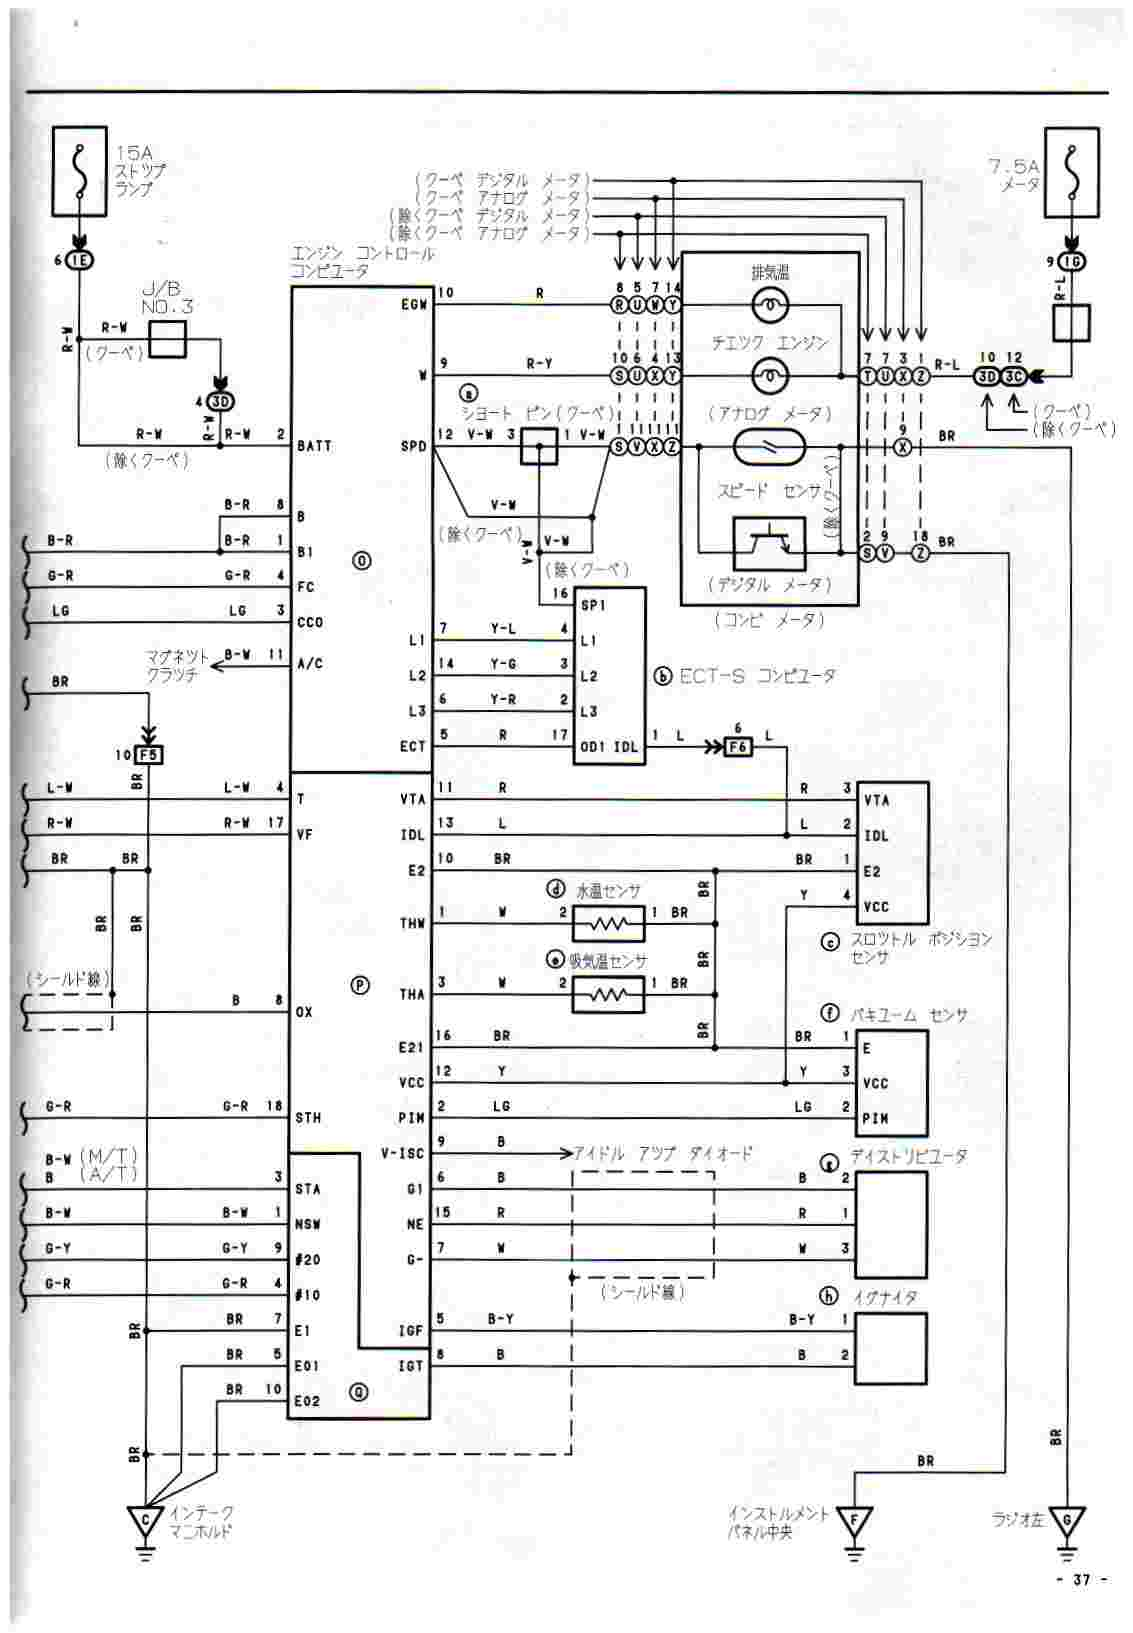 4age Tvis Wiring Diagram